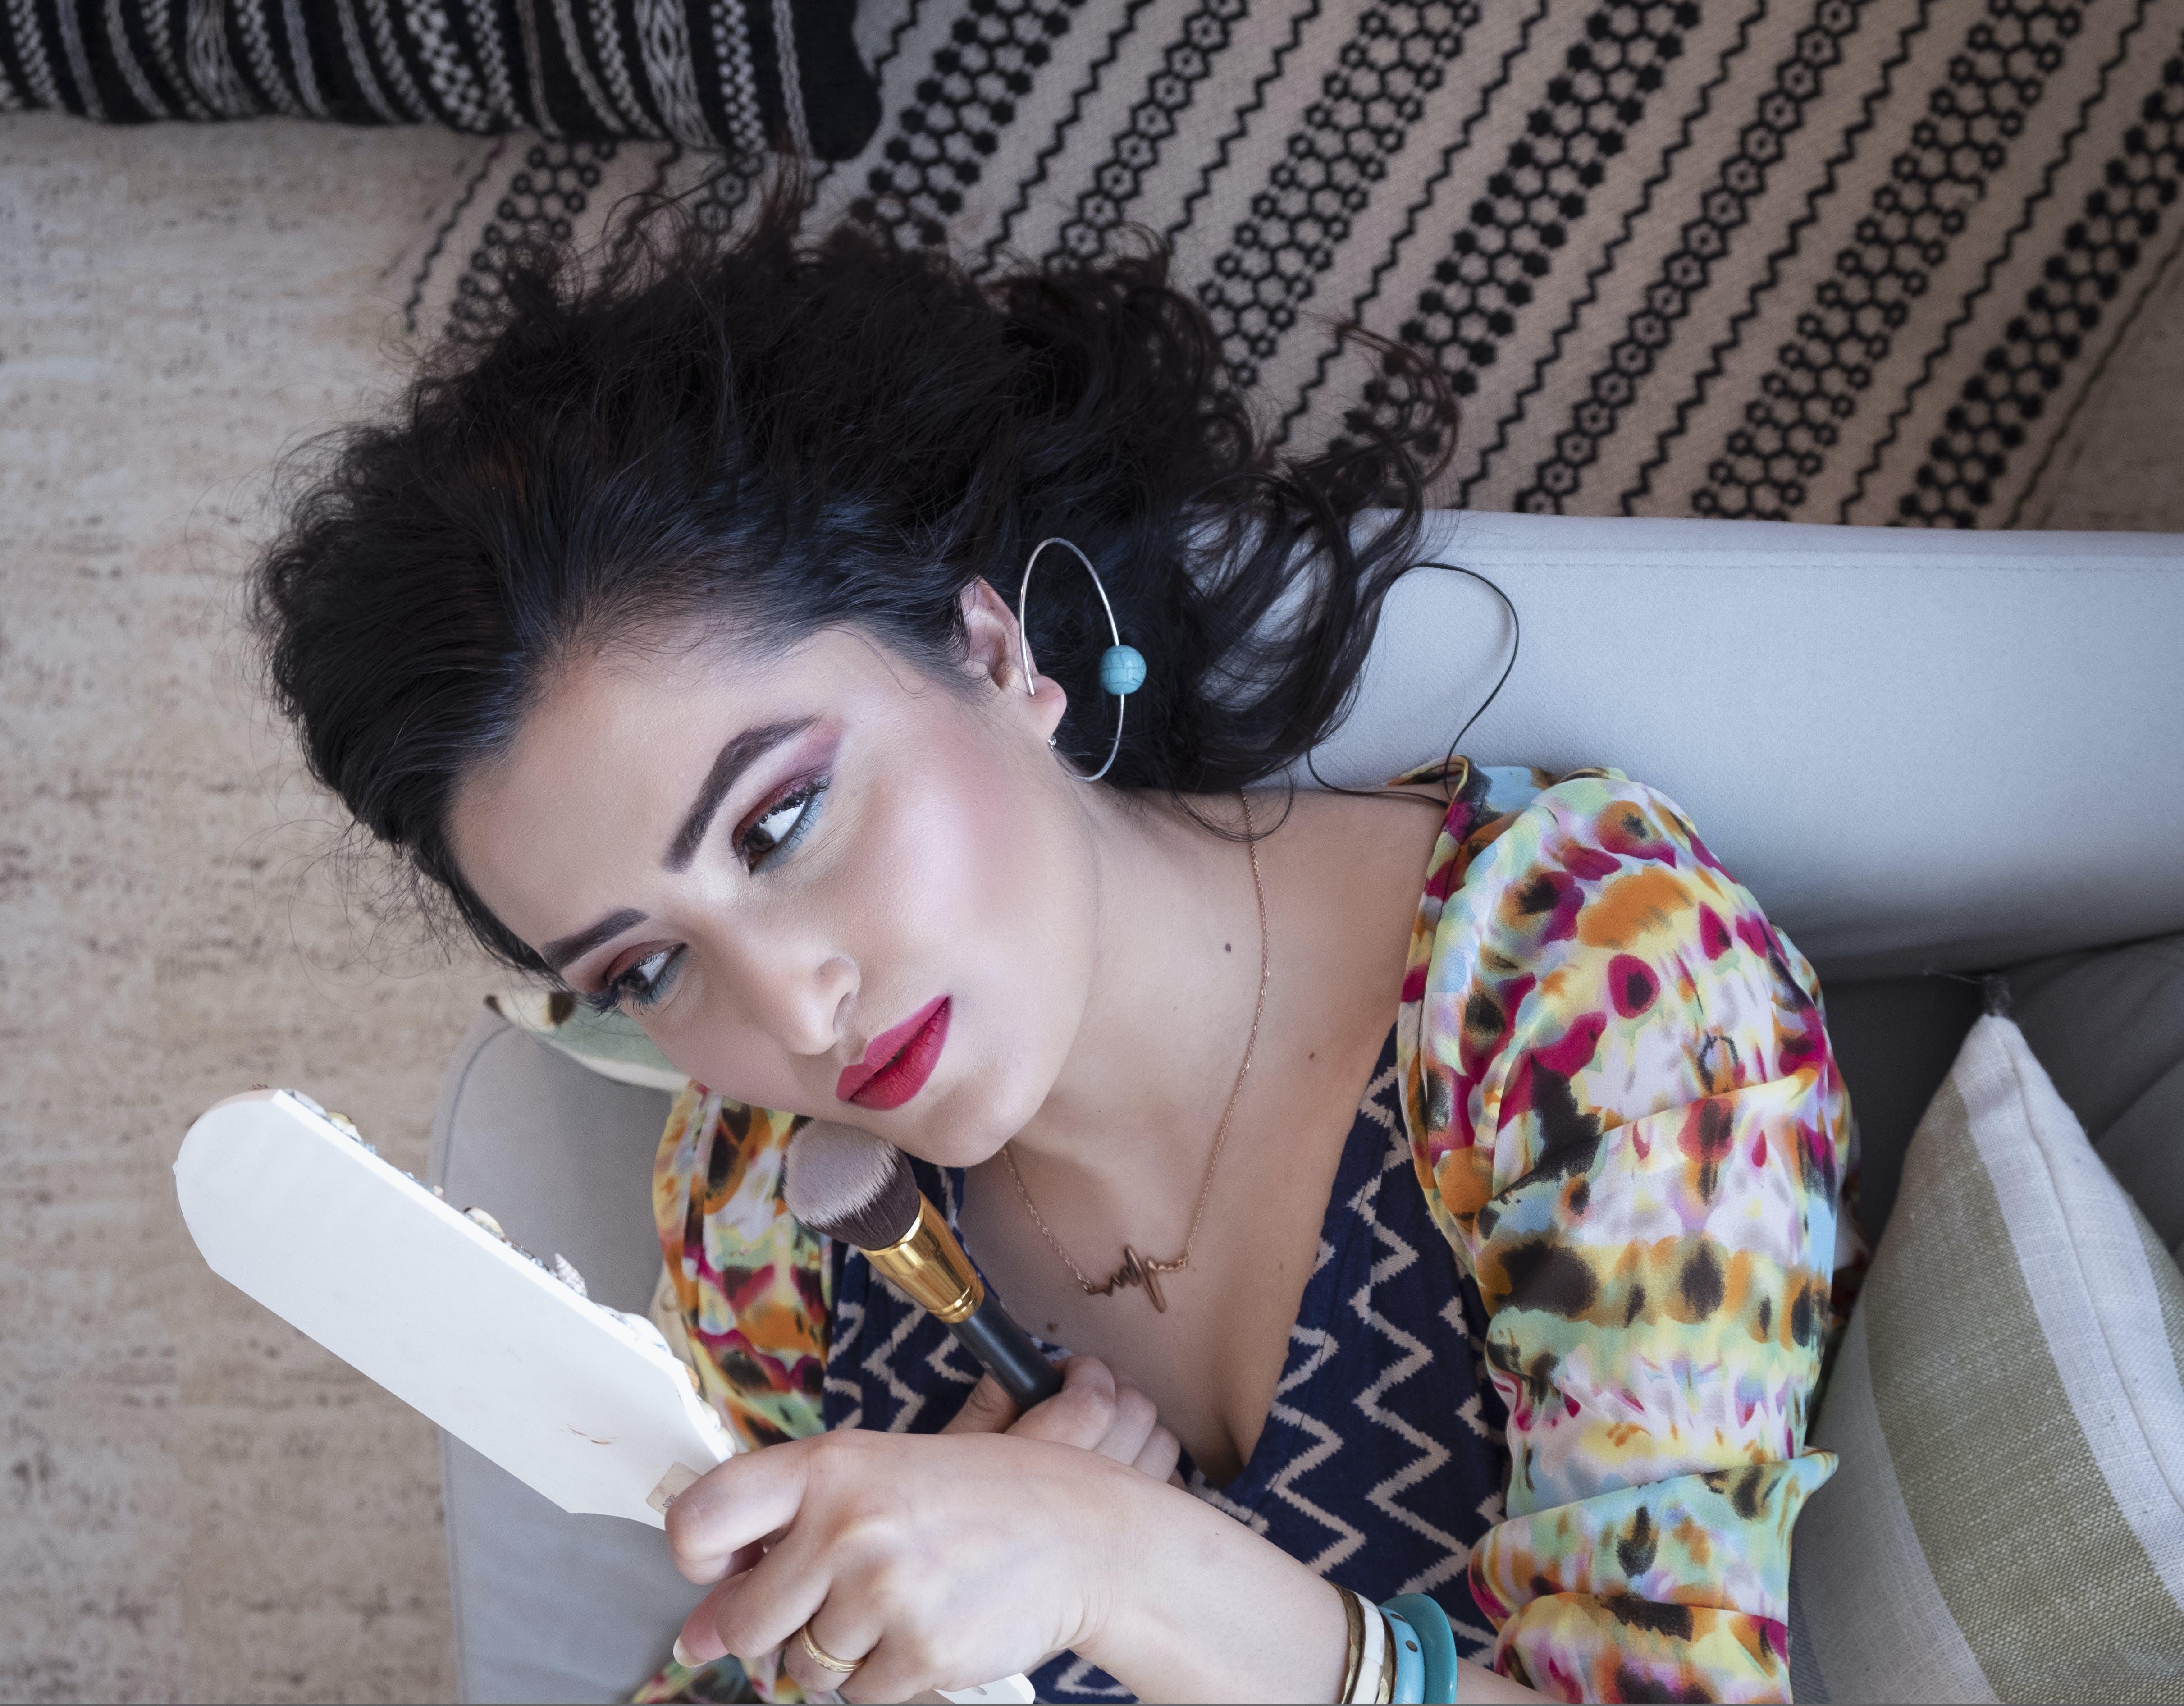 Woman Lying On Sofa Holding Mirror